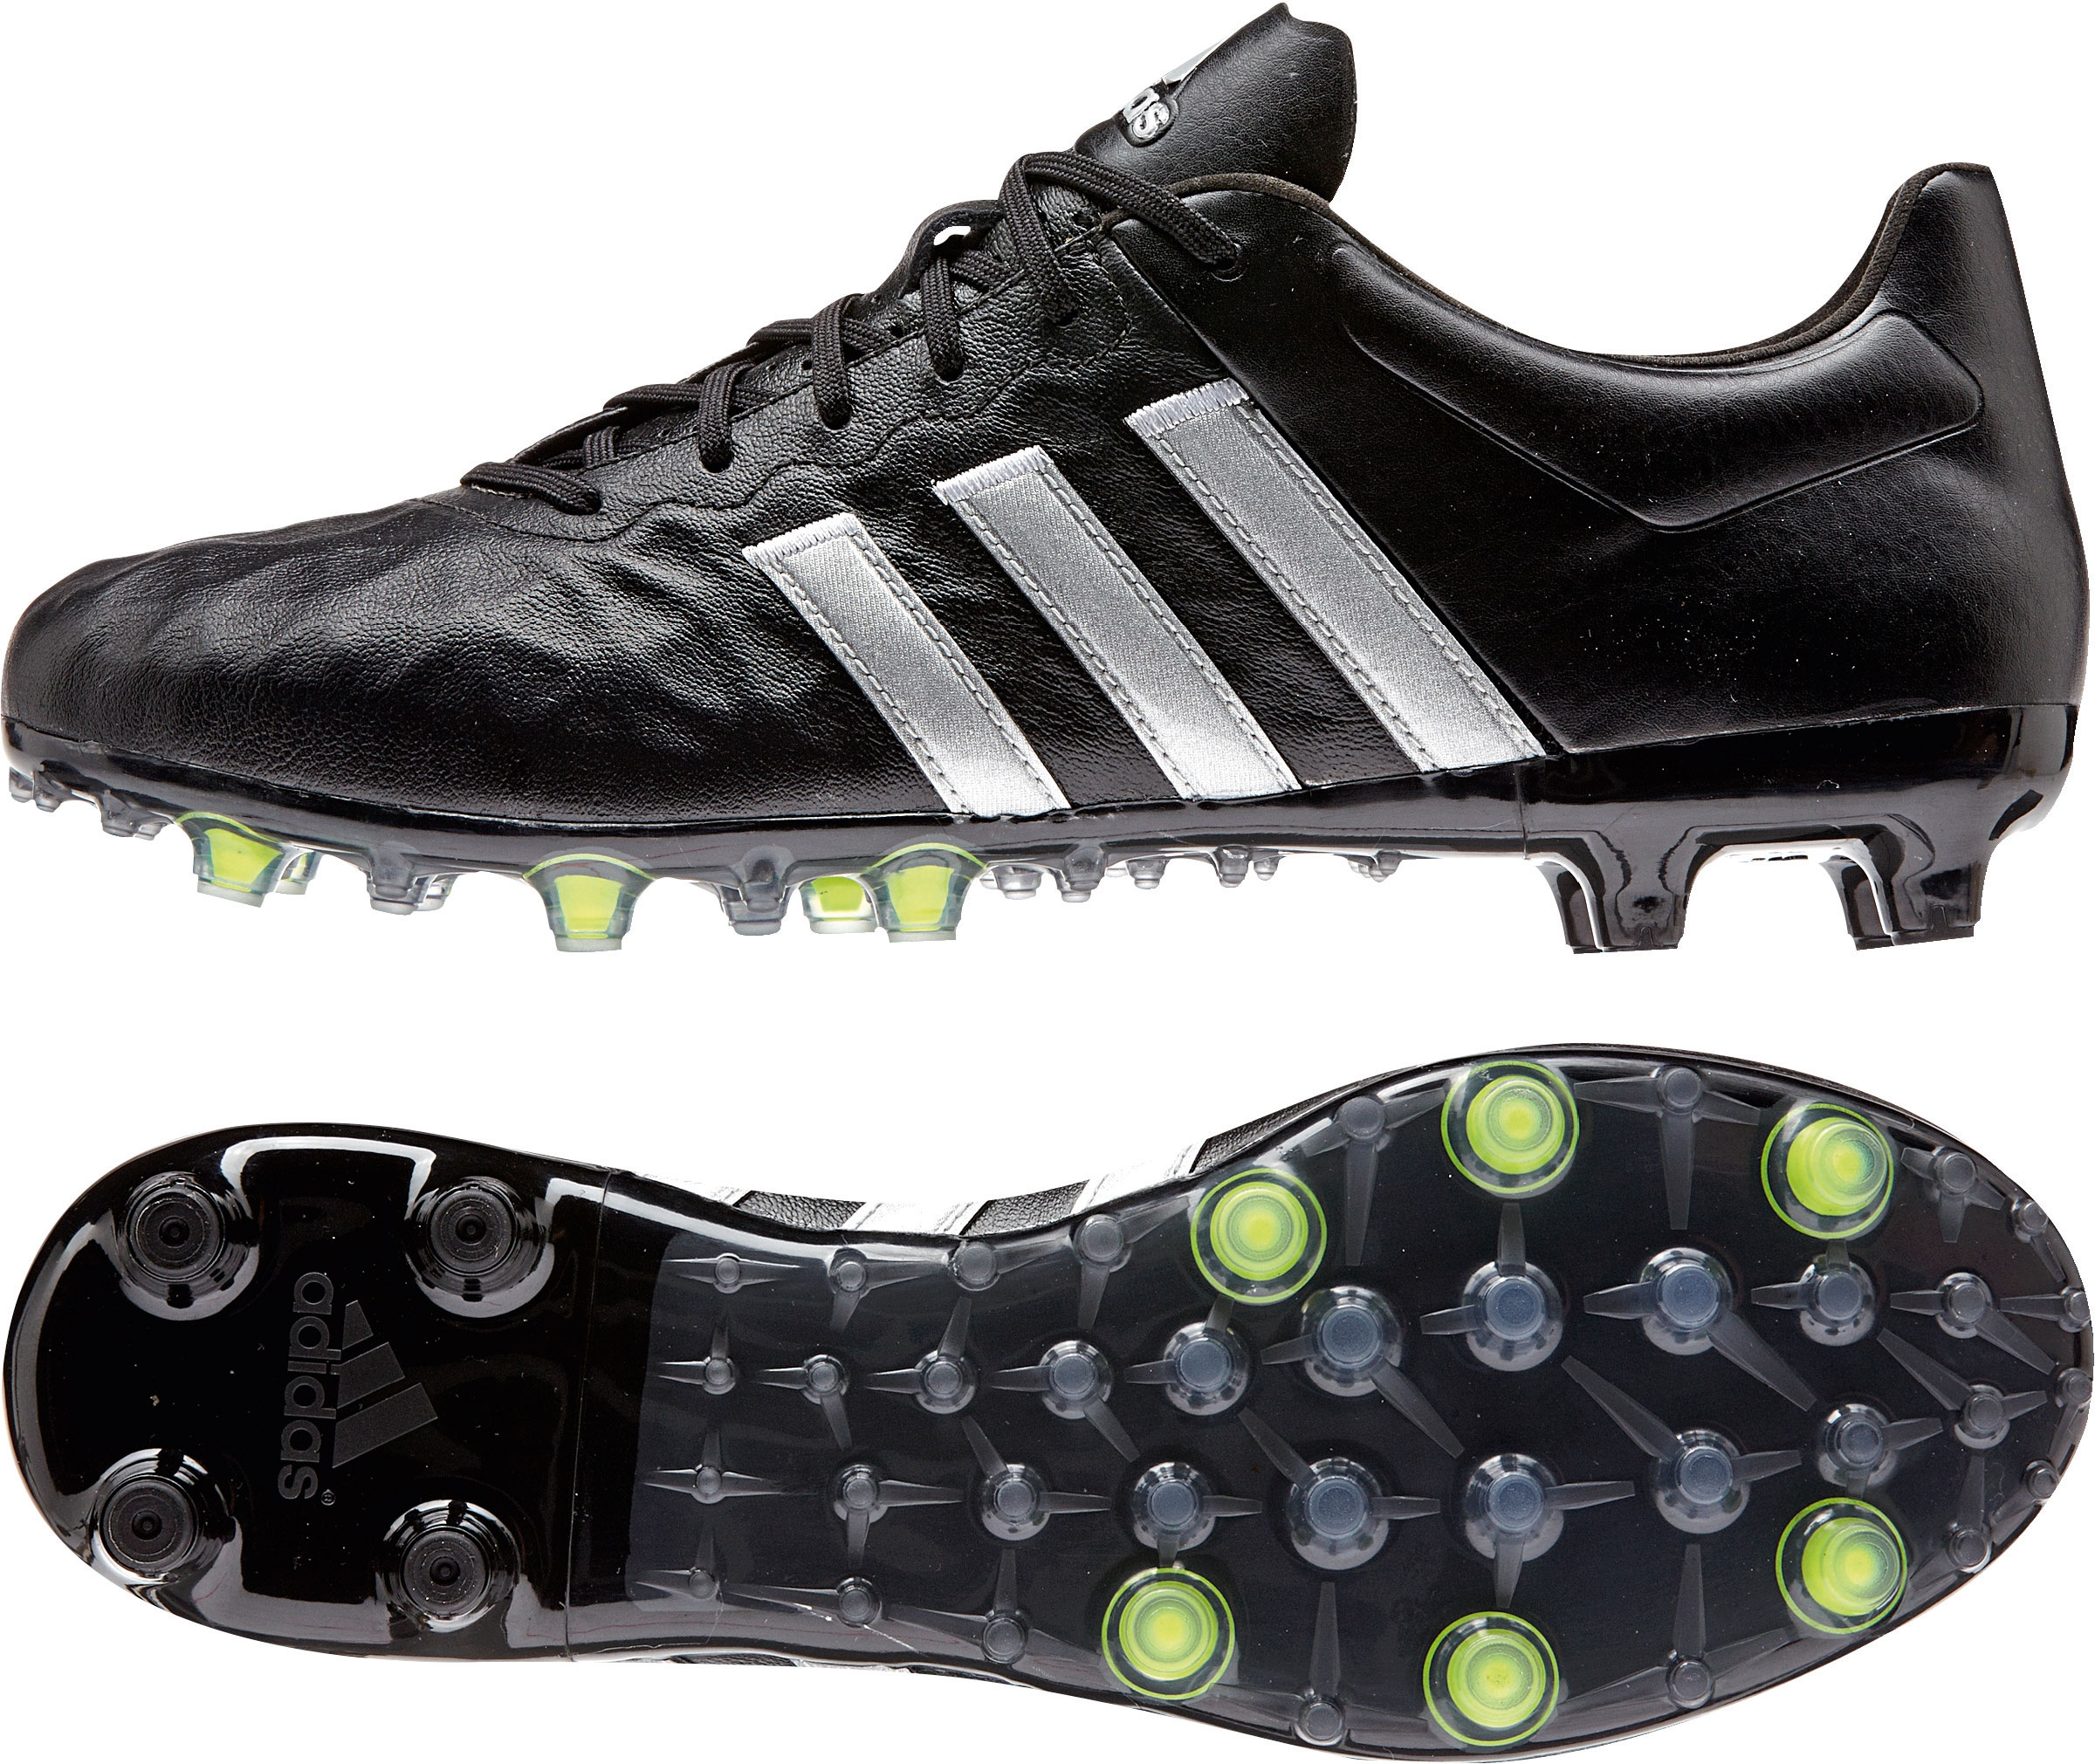 Herren Fußballschuh ACE 15.2 FG/AG Leather, CBLACK/SILVMT/SYELLO, 7,5